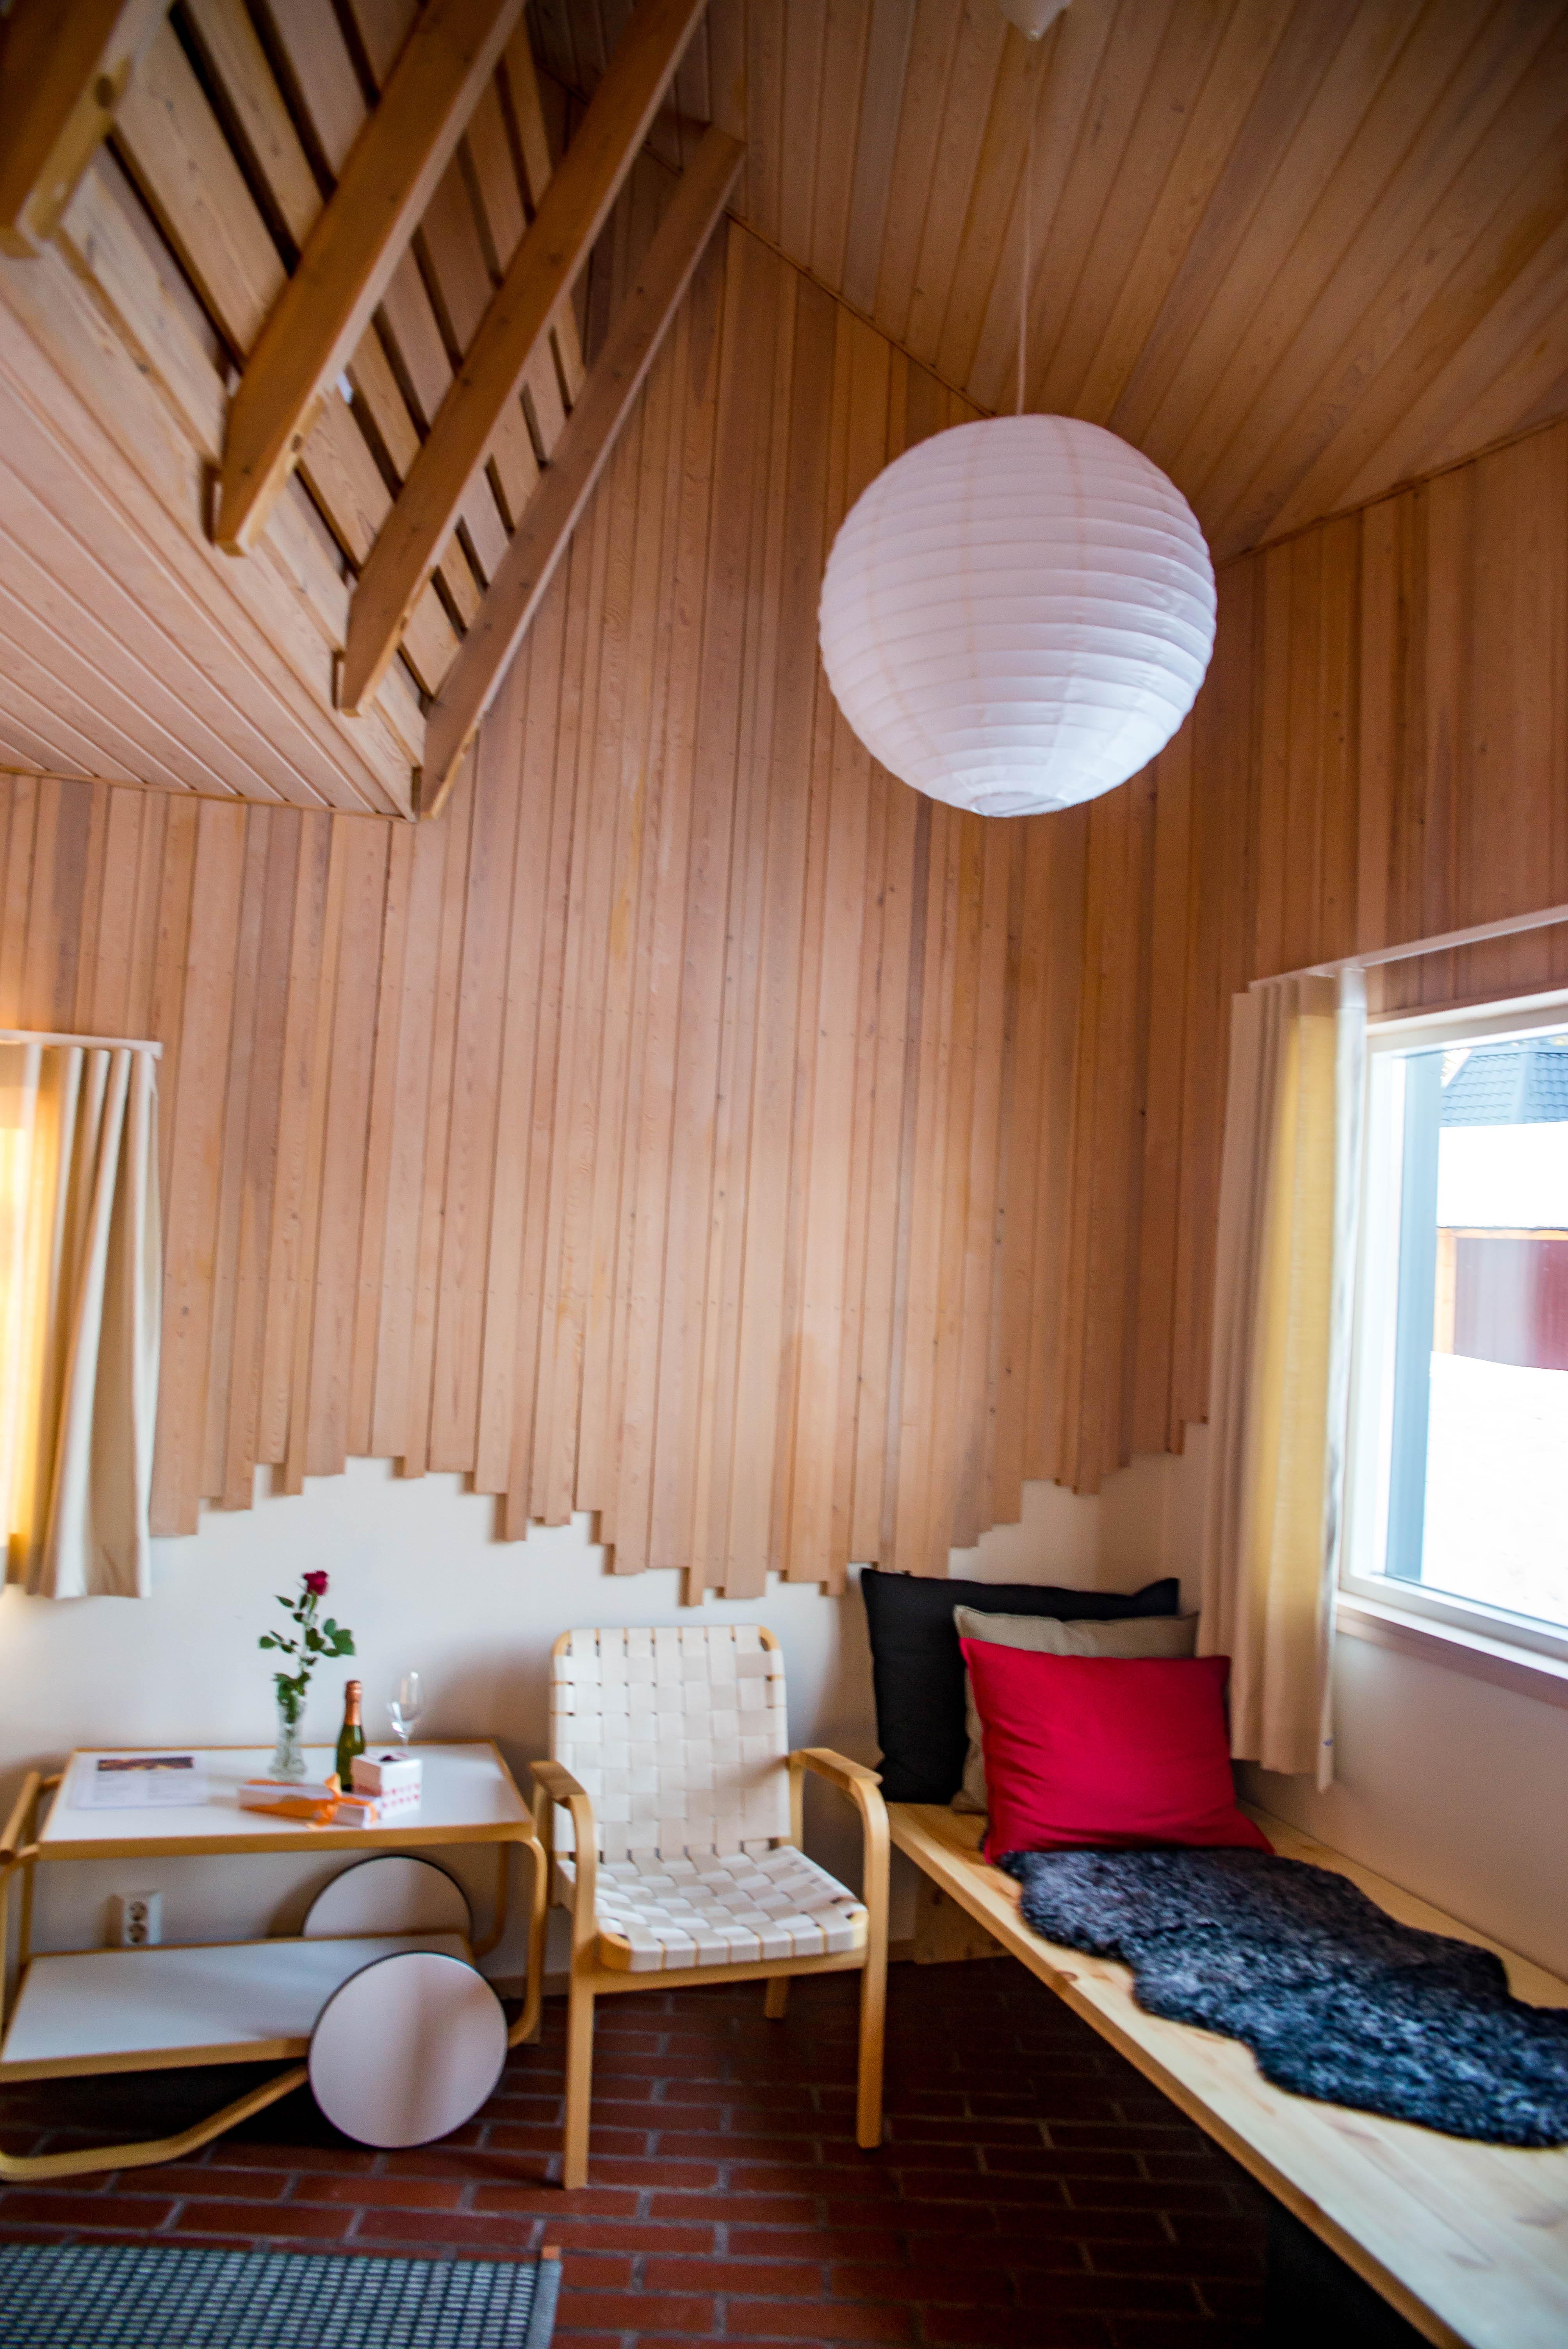 Hotel Vartiosaari Lapland Finland